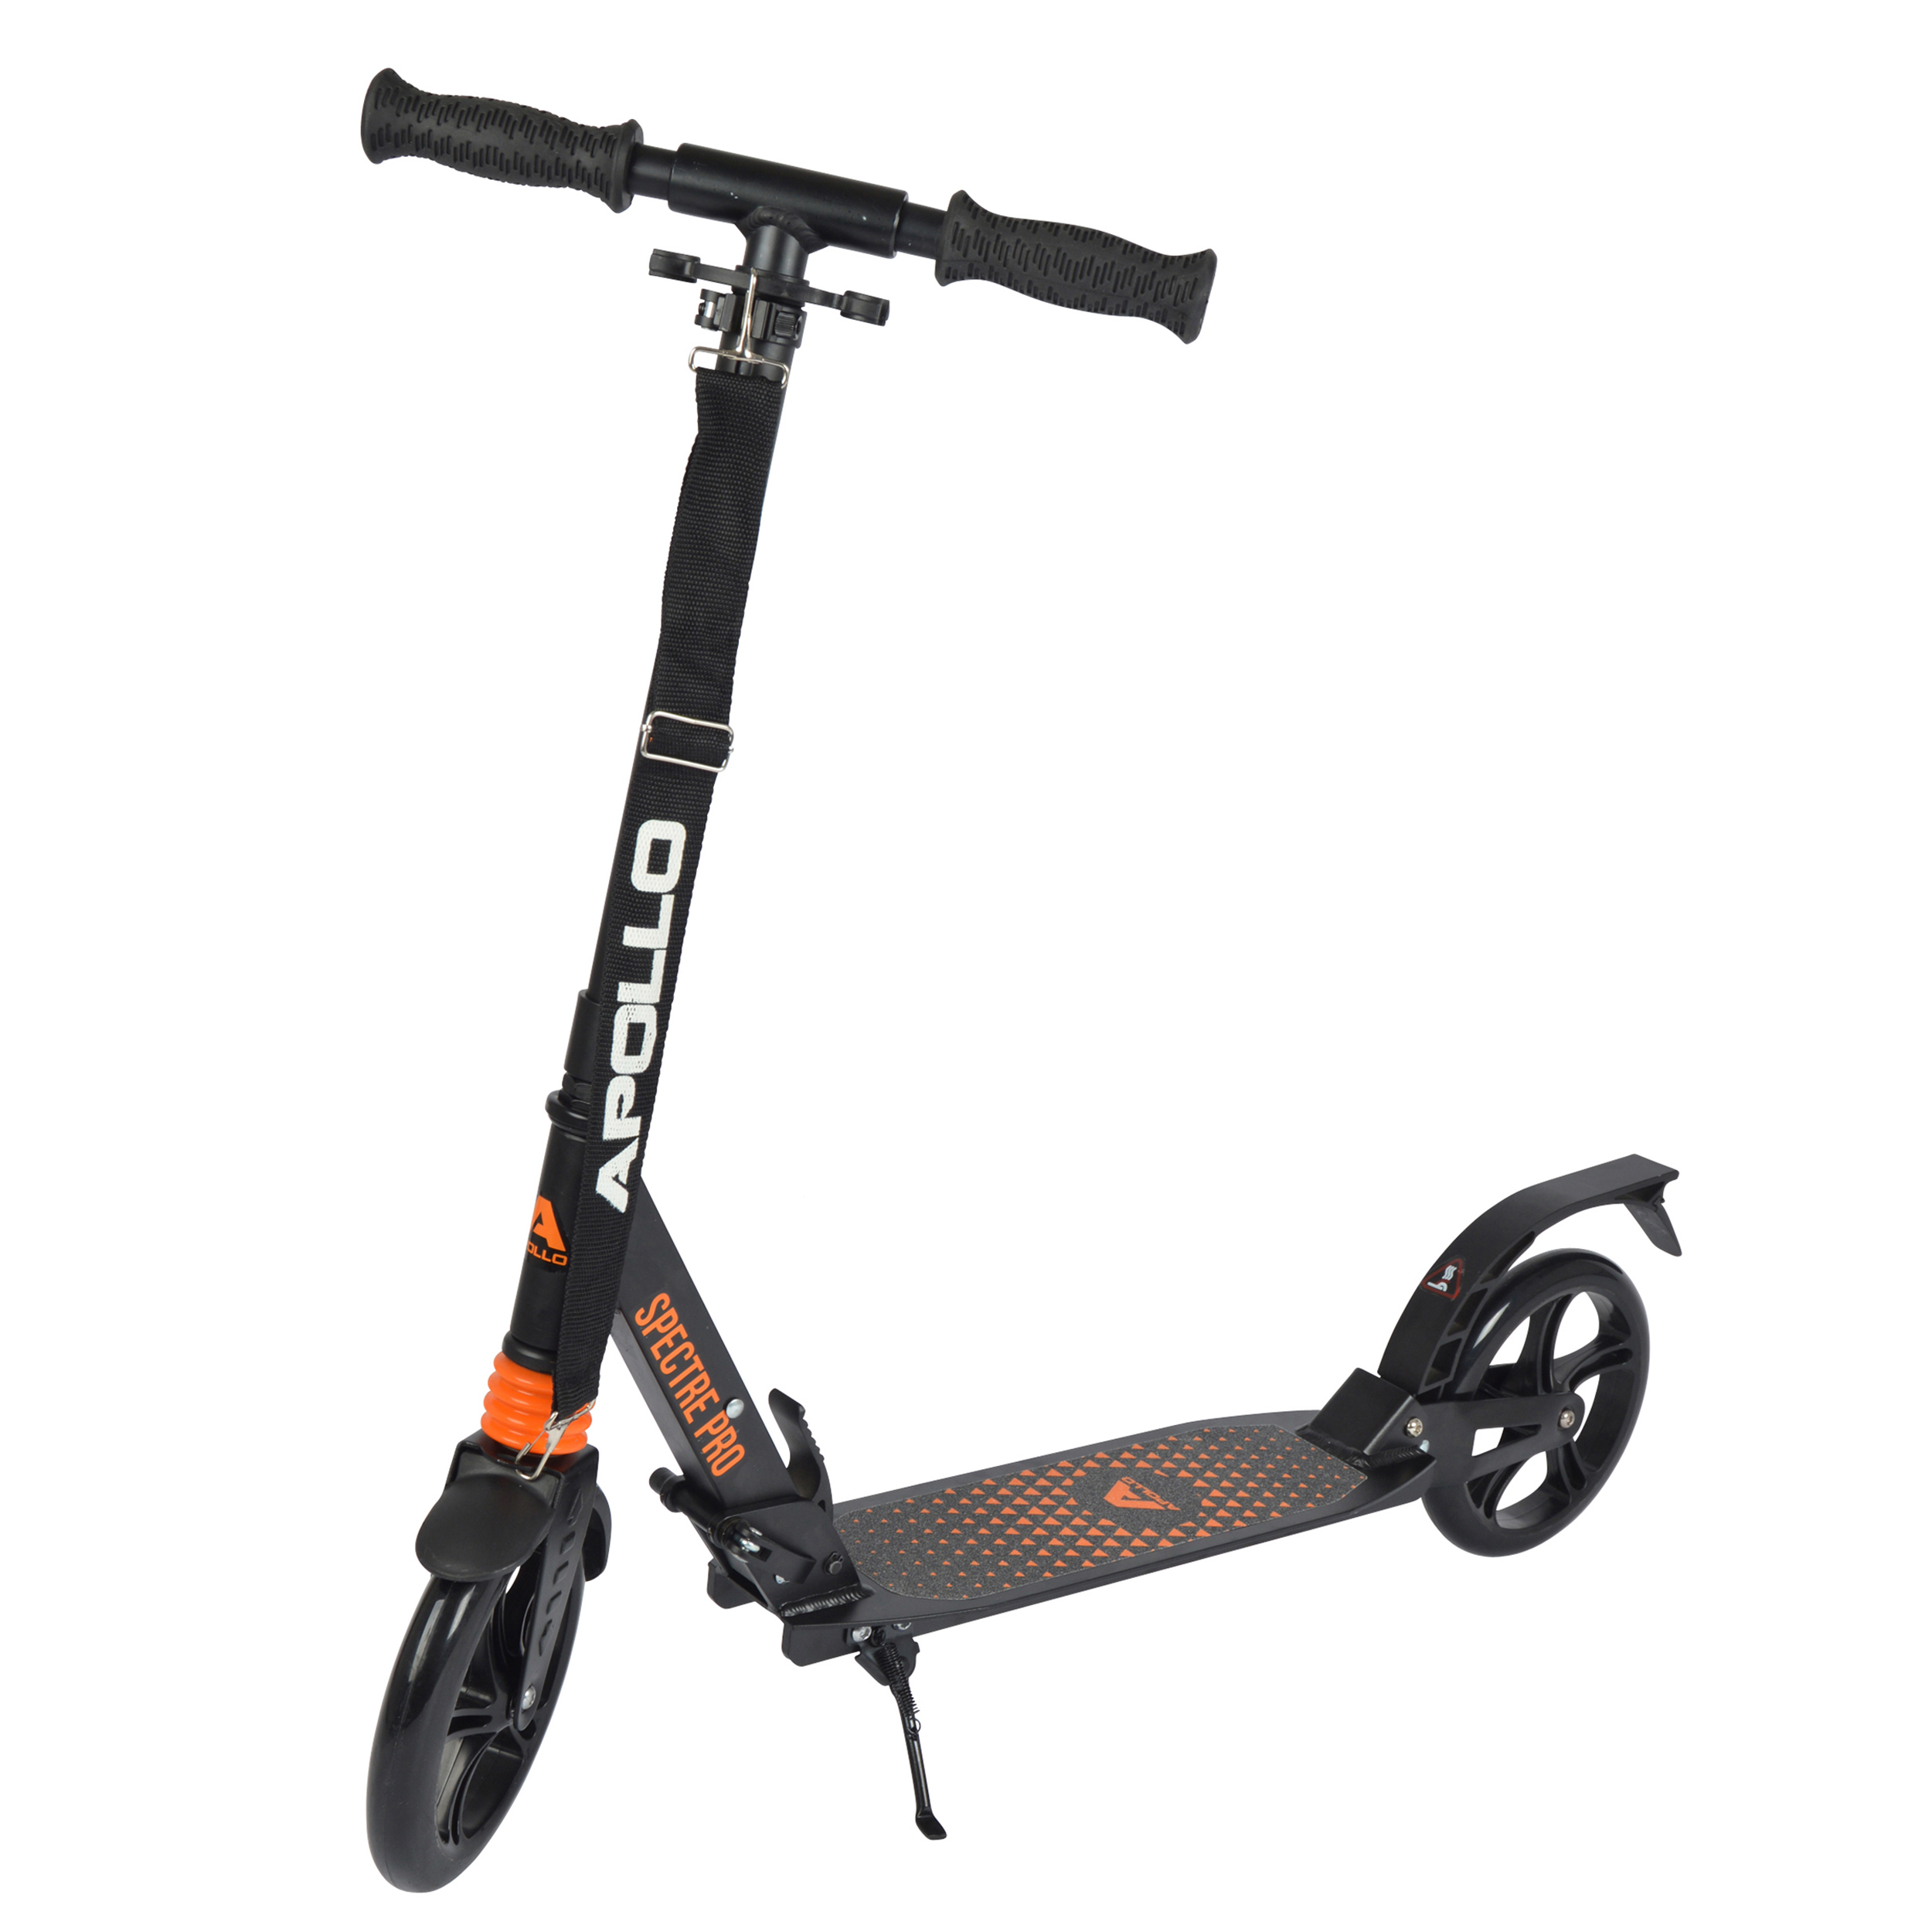 City Scooter - Spectre Pro - Orange